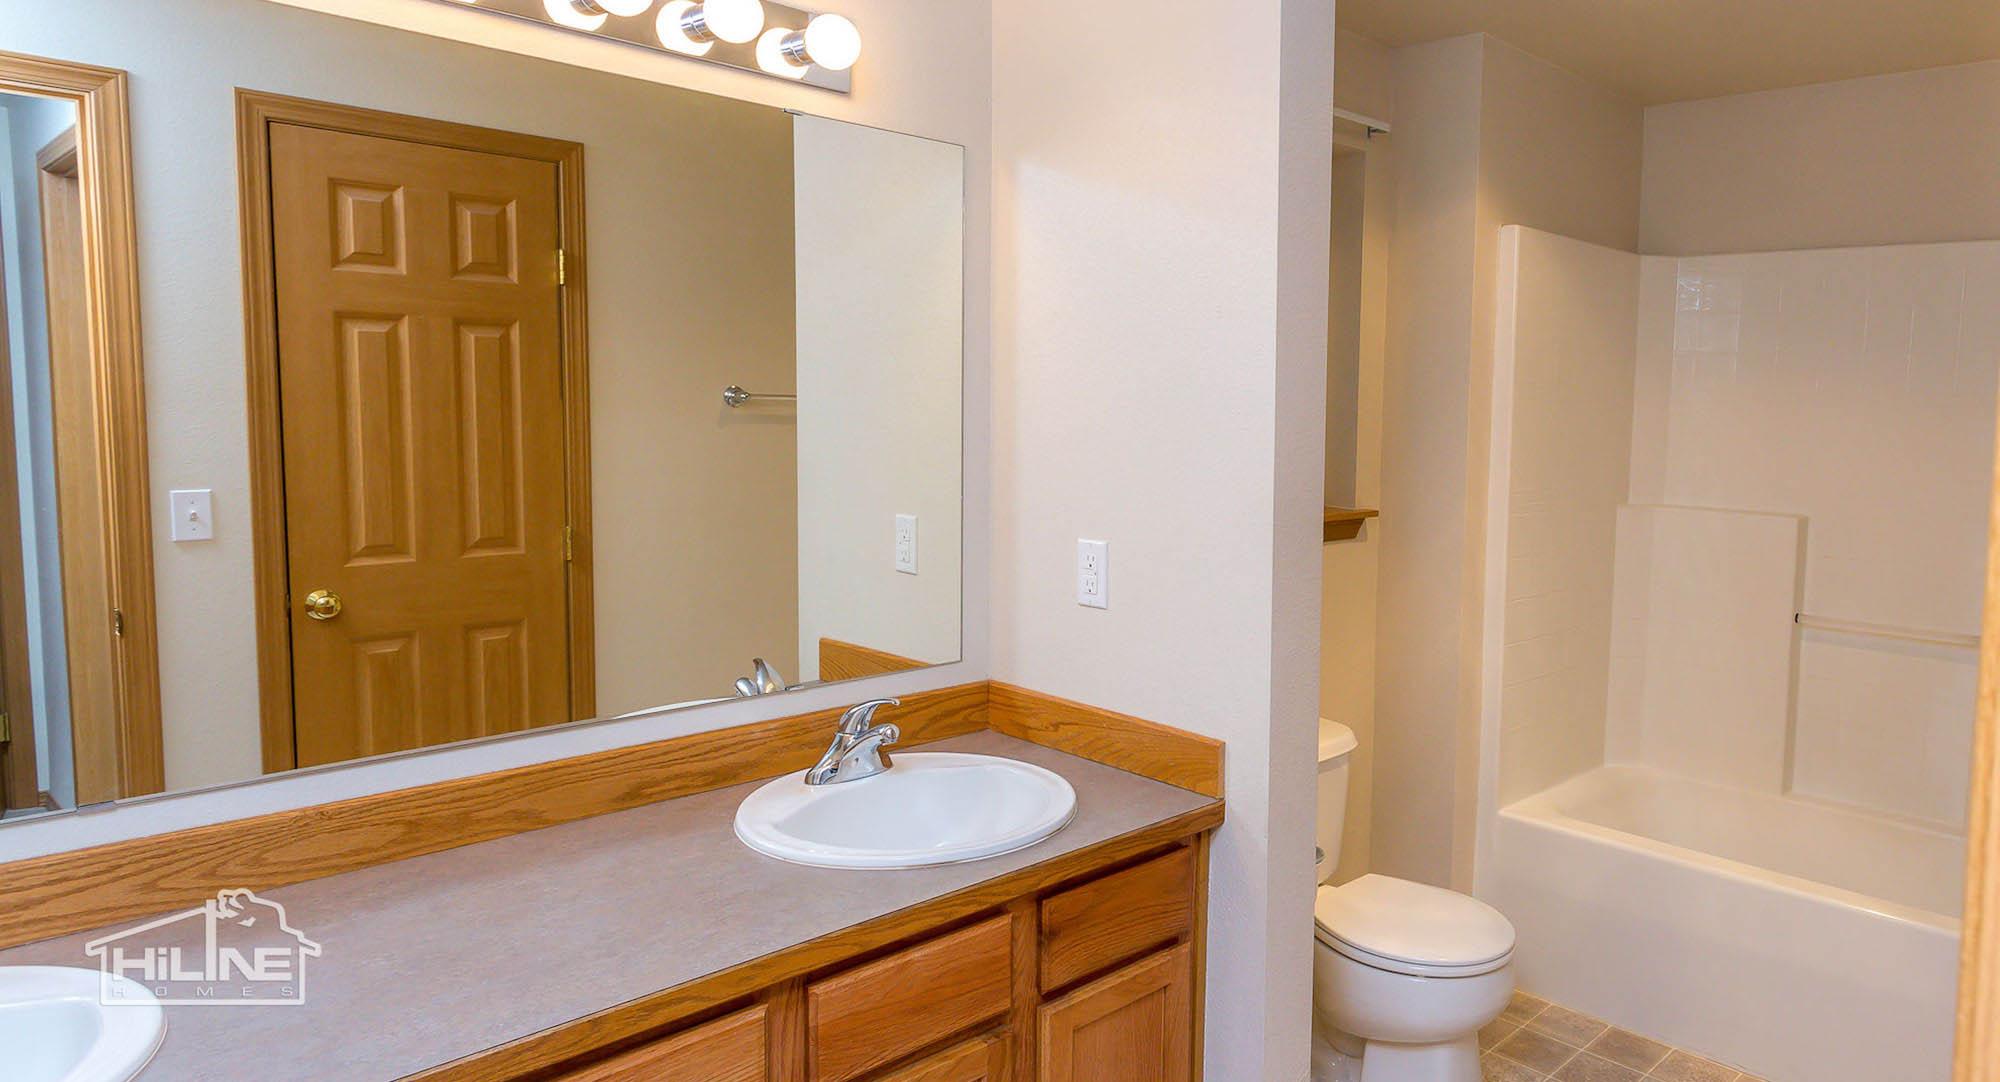 HiLine Home Plan 2345 Master Bath